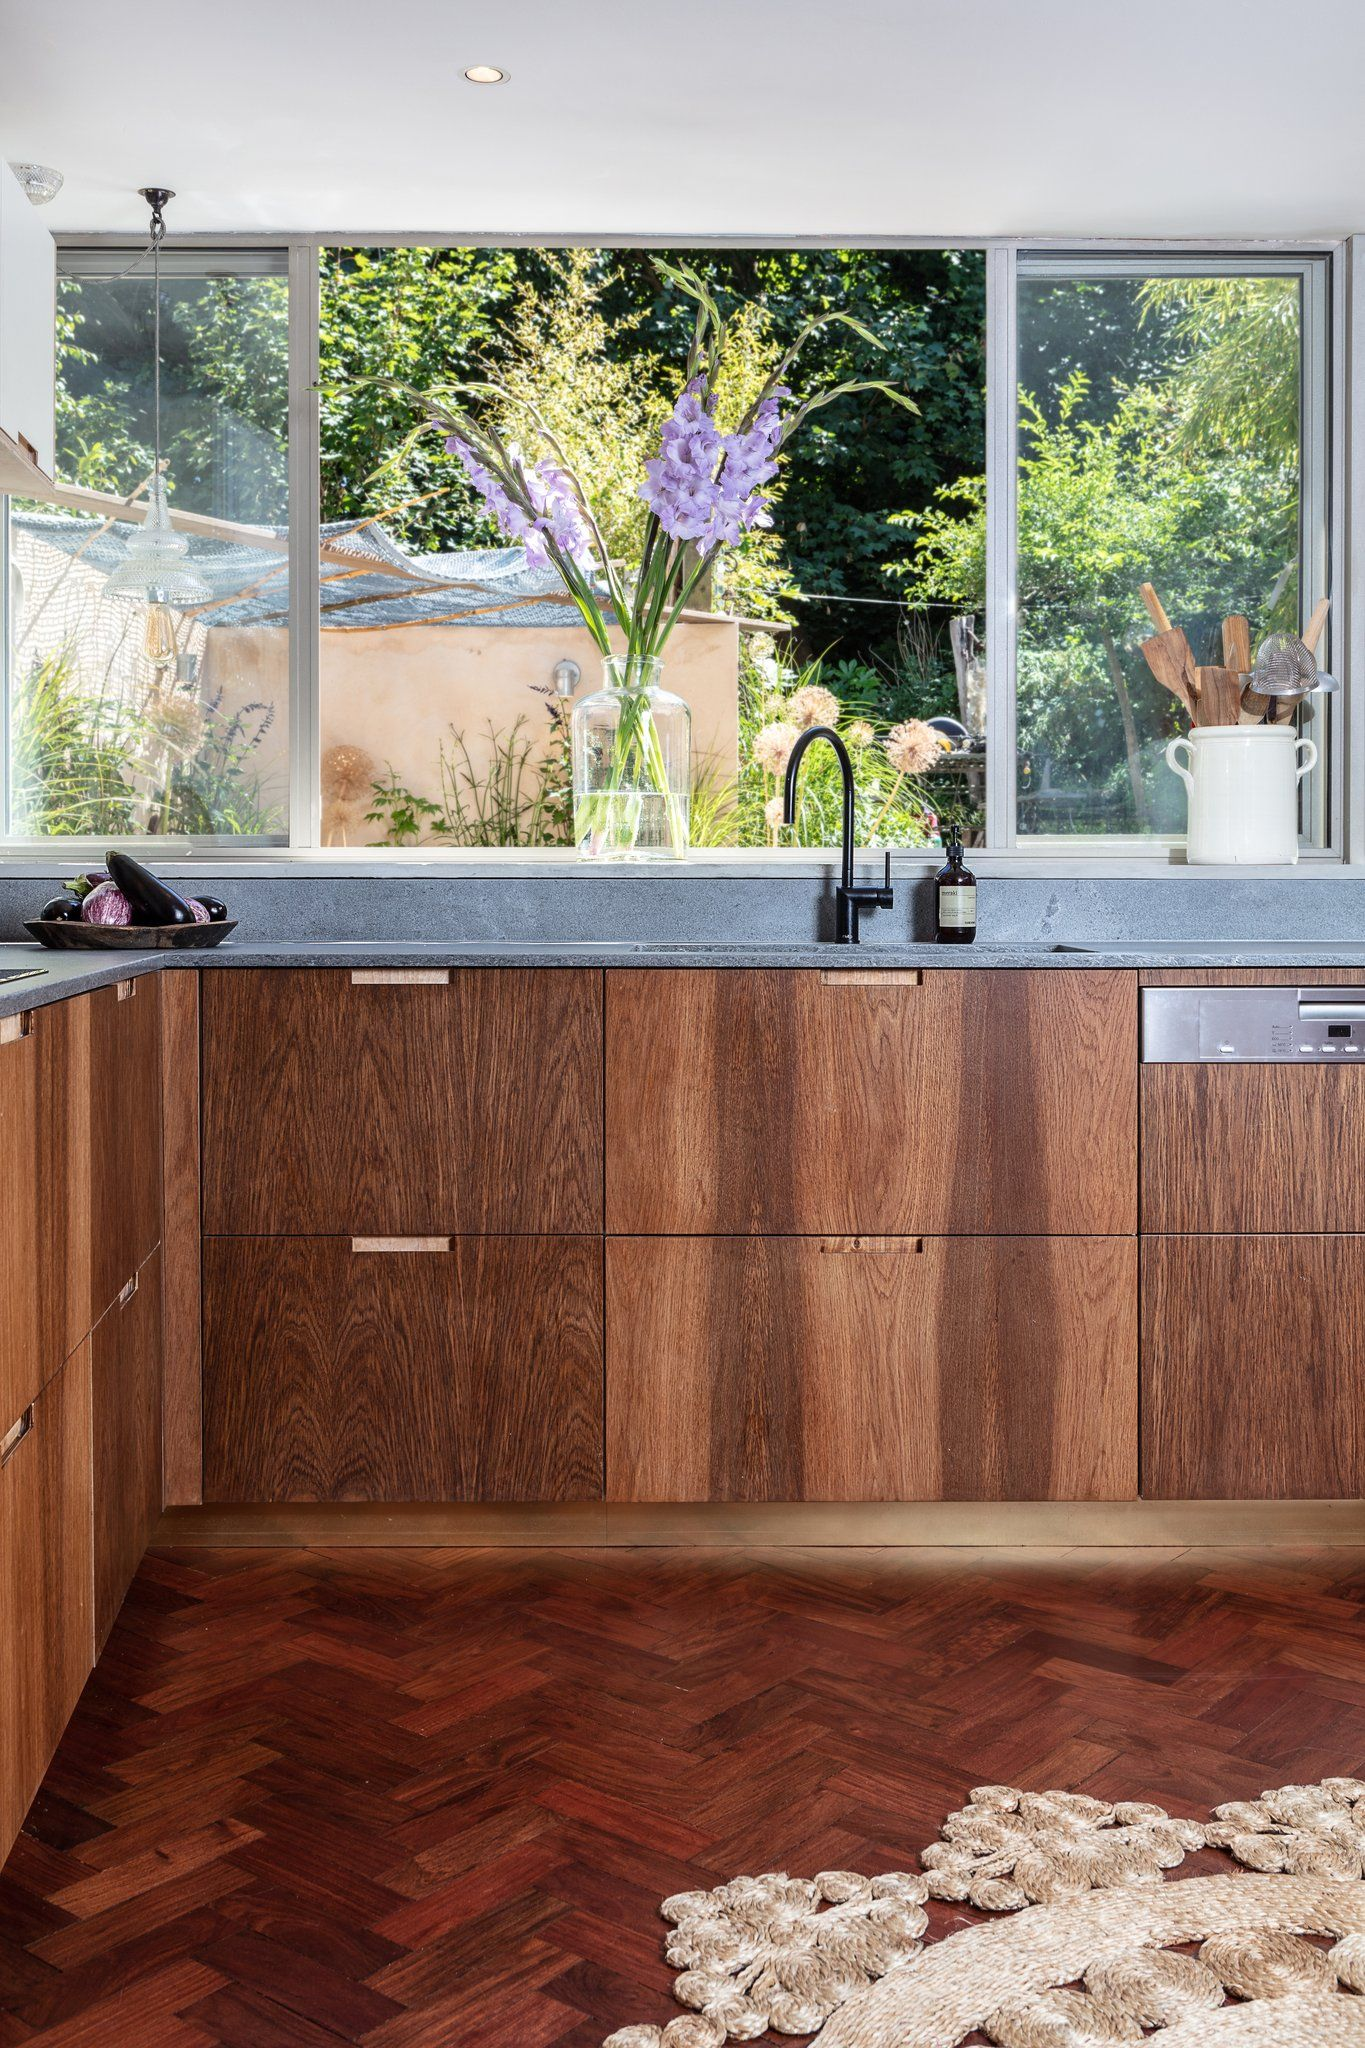 Rare Brown Oak Birch Plywood with concrete quartz